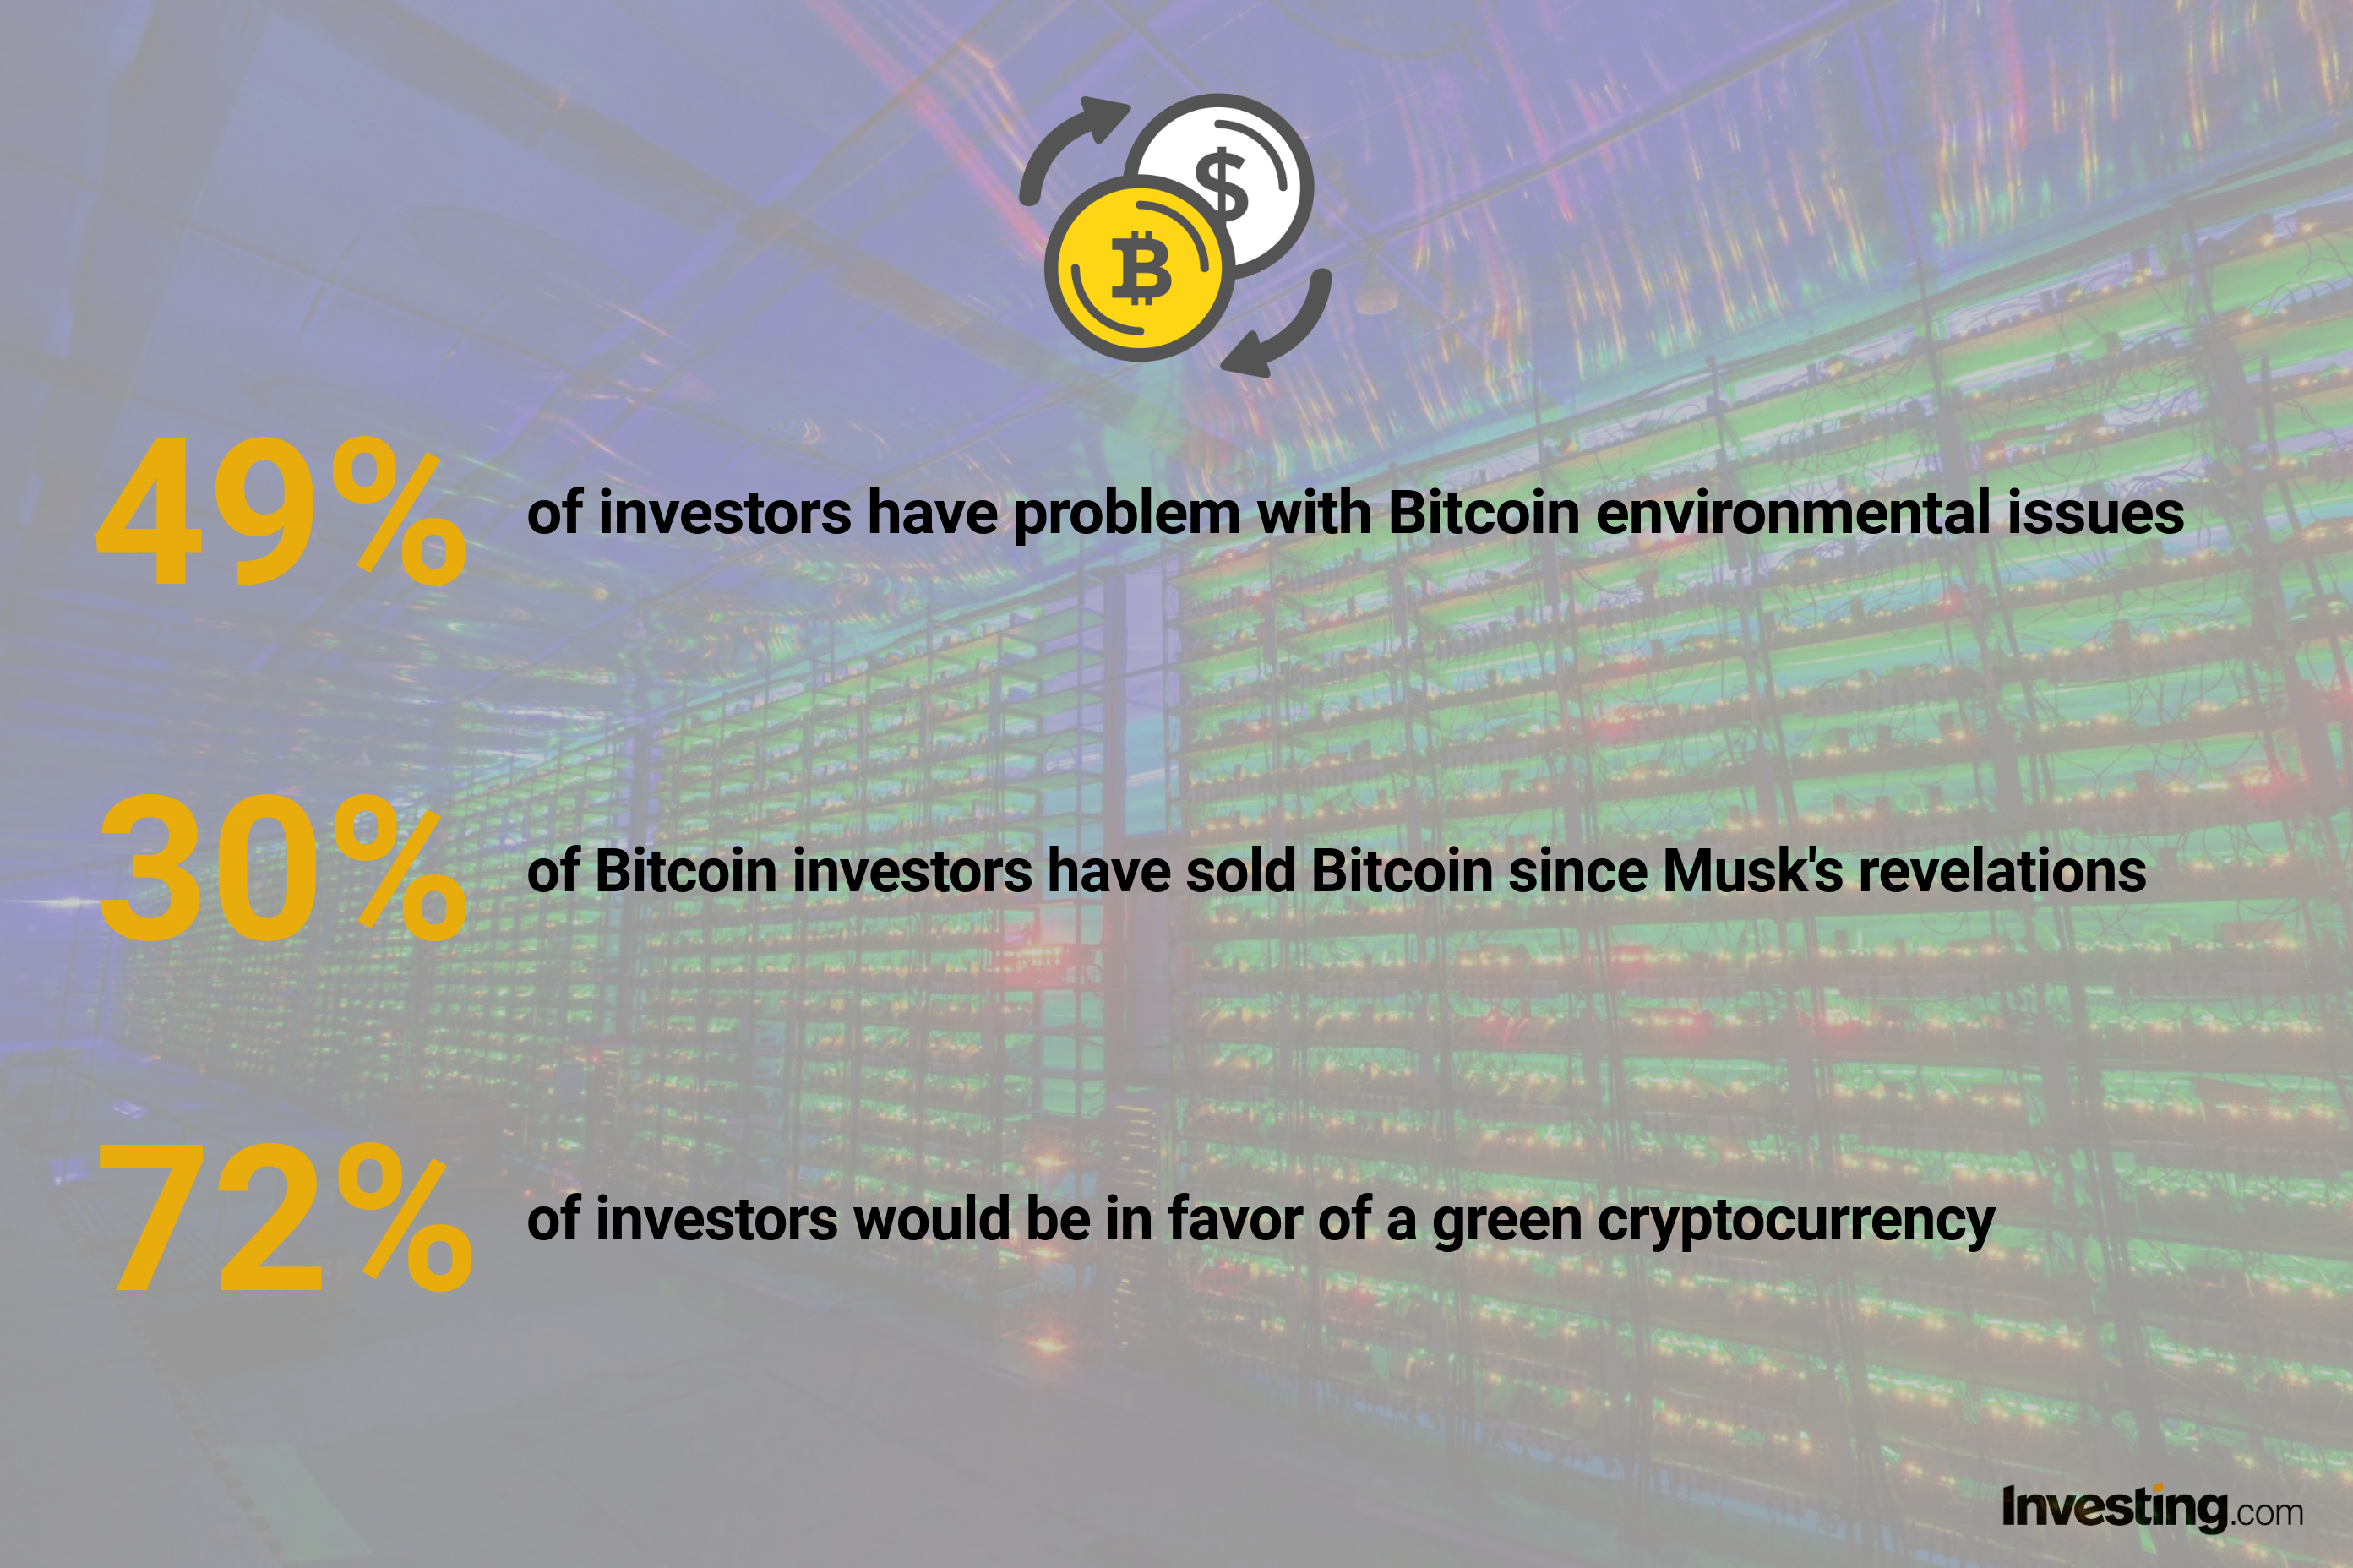 Investors in favor of green crypto